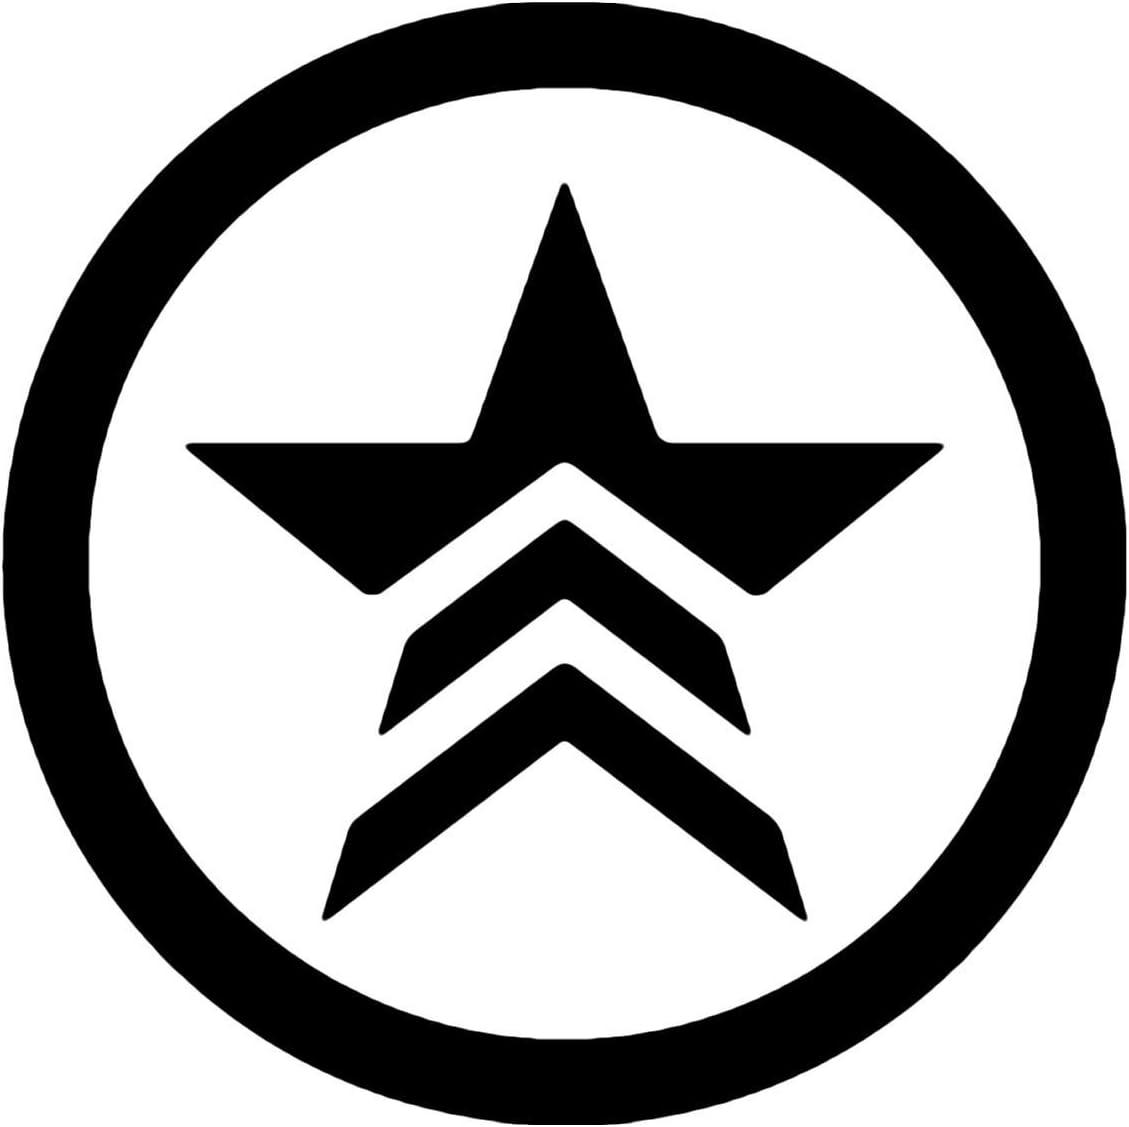 "Mass Effect 5.5"" Renegade Logo Decal Sticker for Cars Laptops Tablets Skateboard - Black"